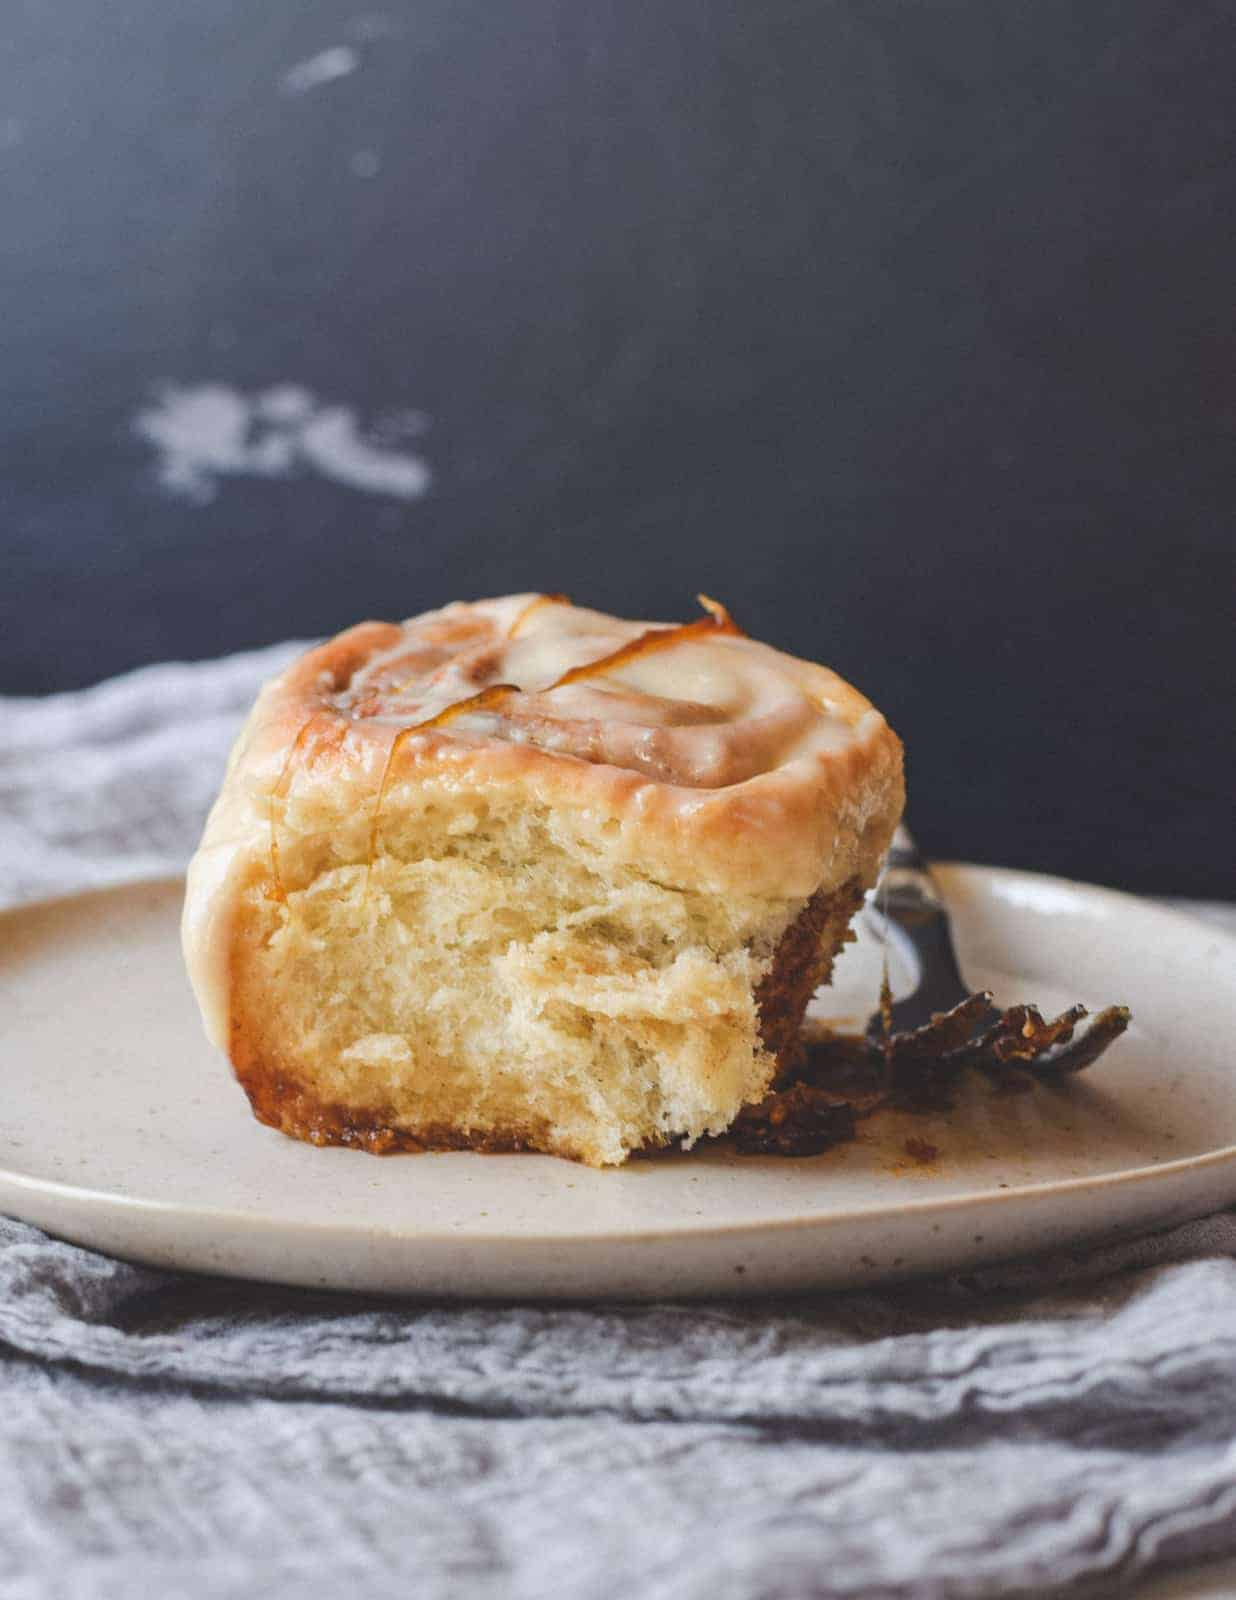 One sticky cinnamon bun on a plate with a fork